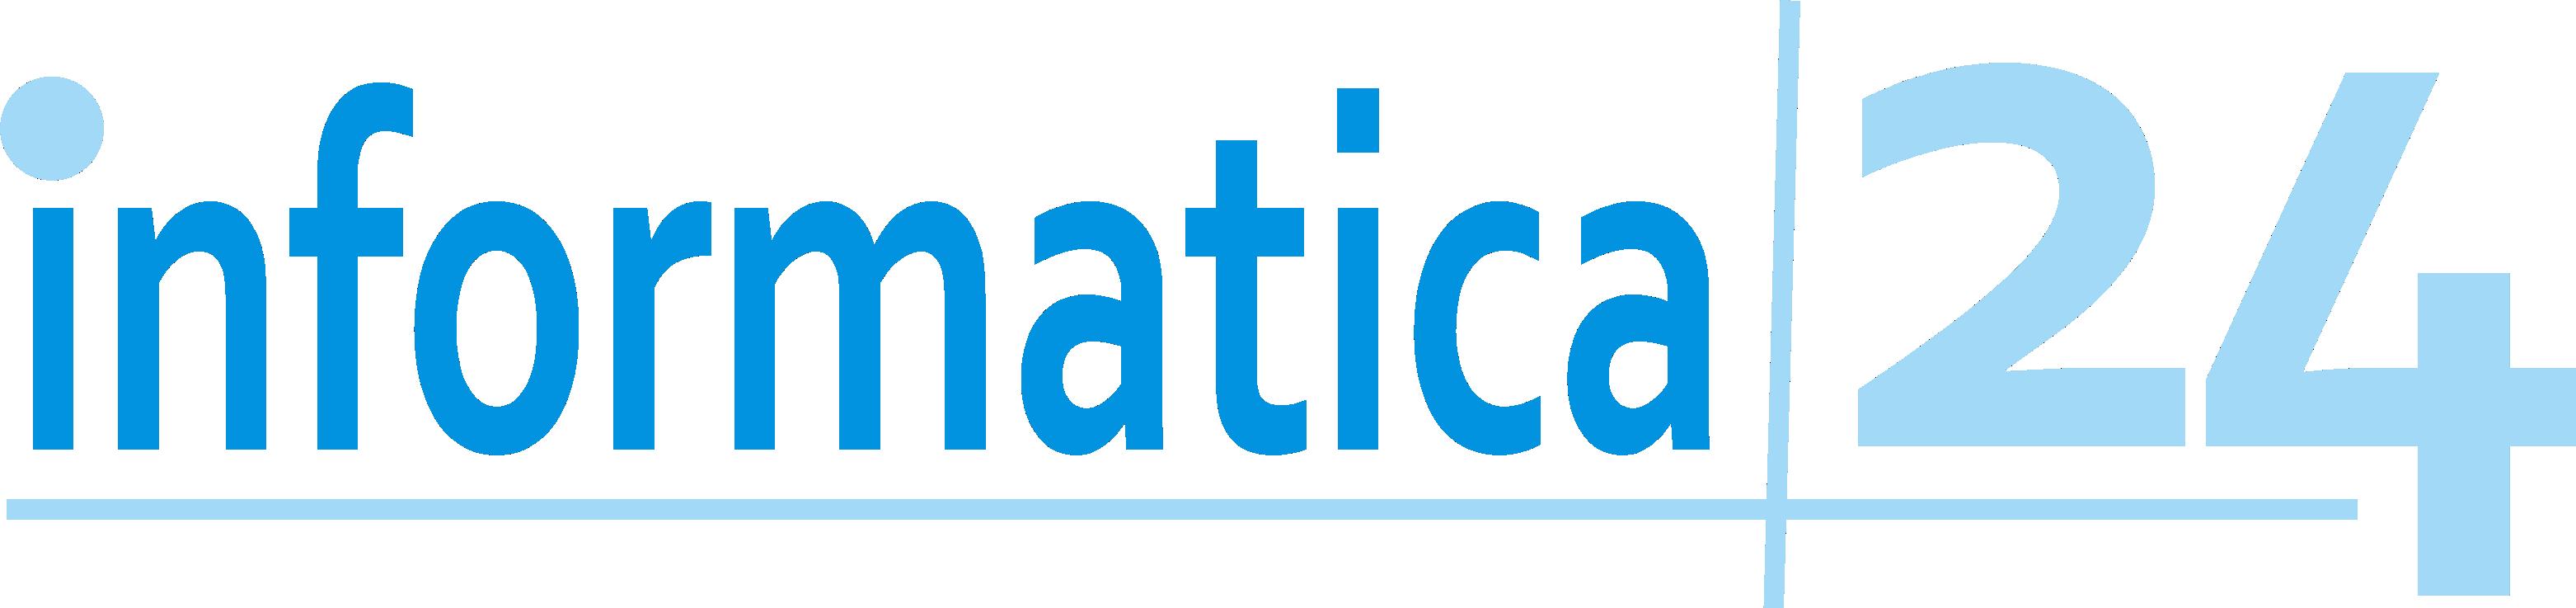 Informatica24